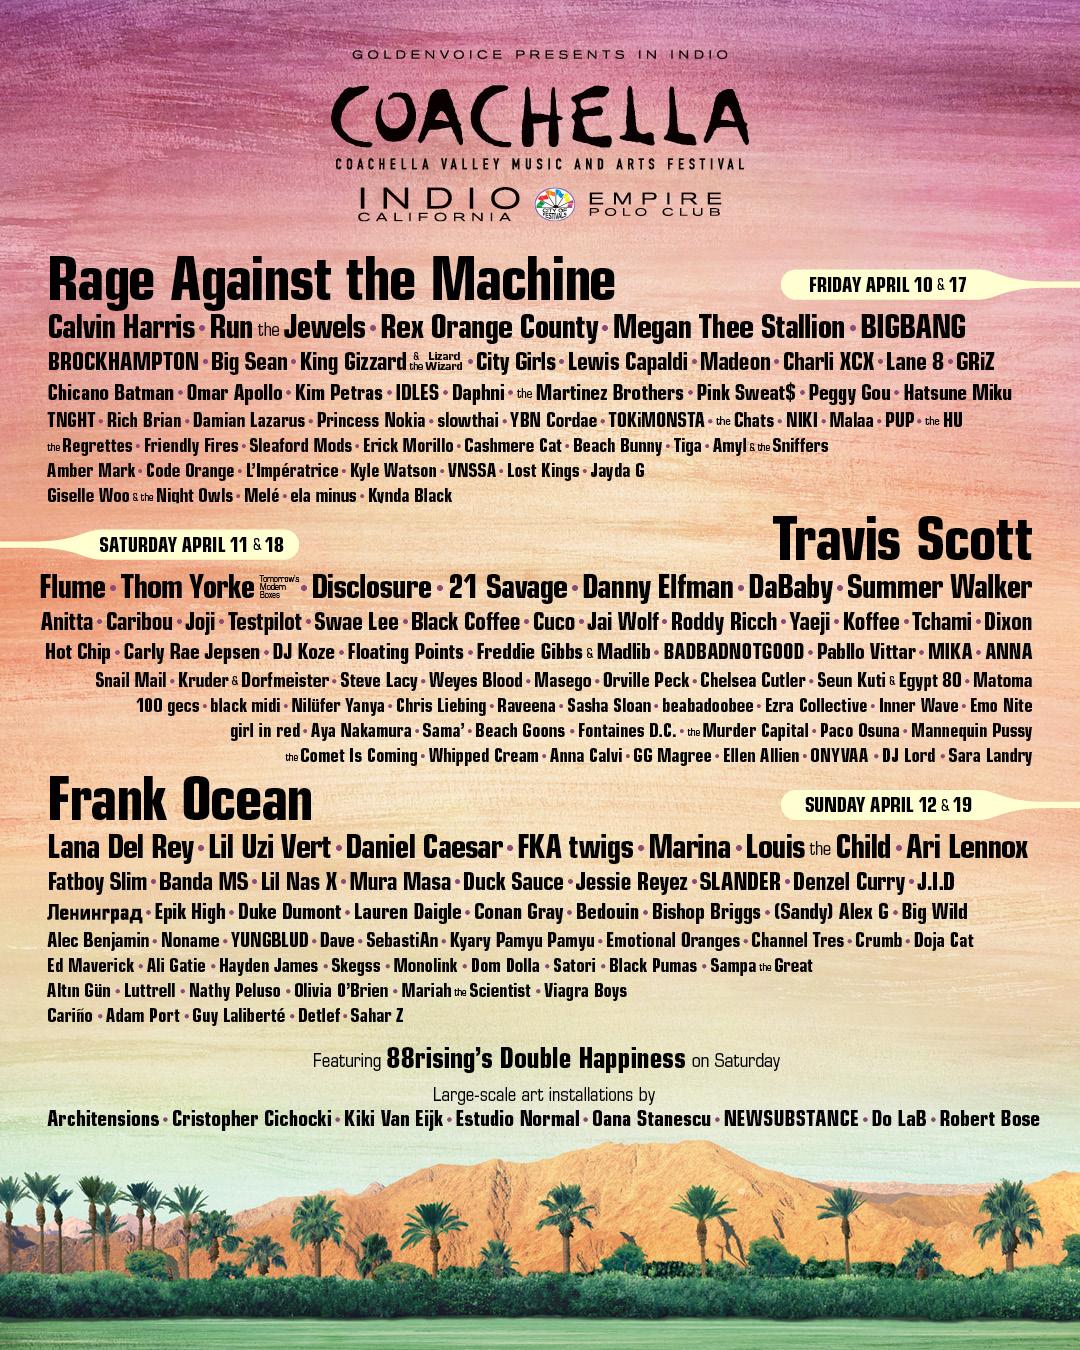 Coachella 2020 Line-up